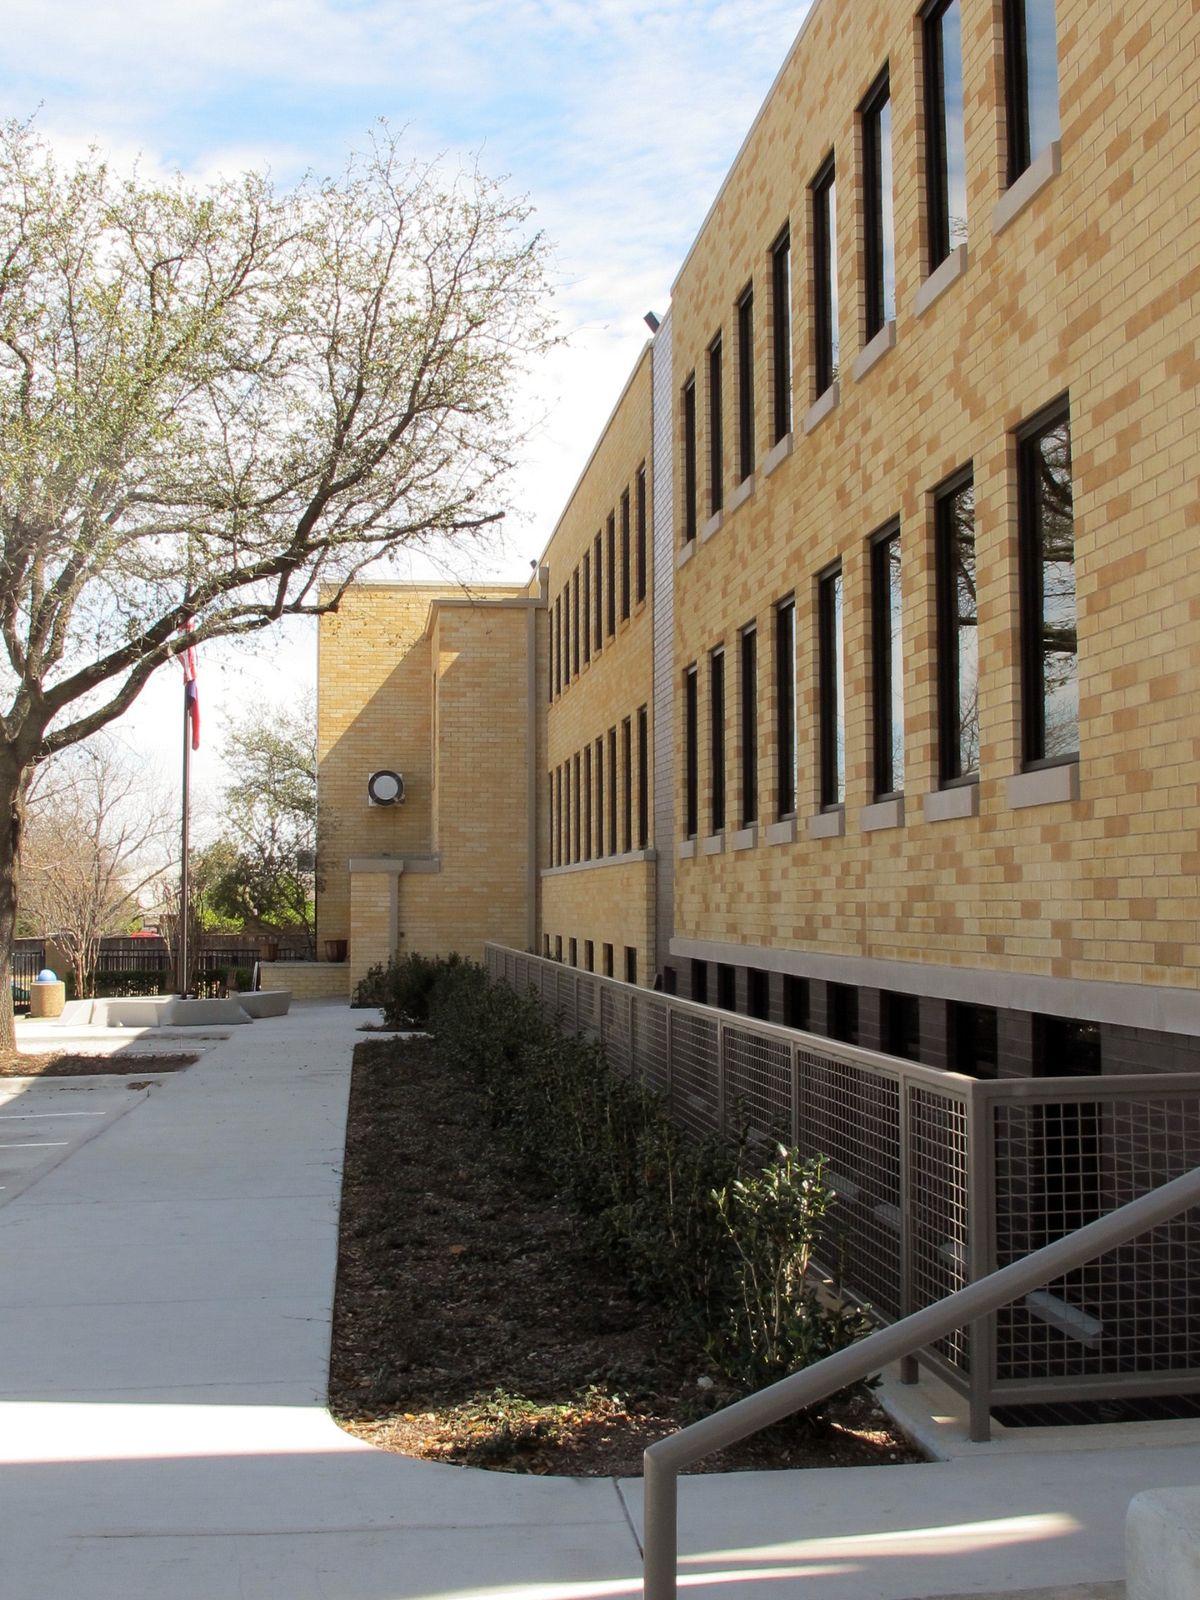 Lakehill School Photo Video Shoot Location Dallas21.jpg